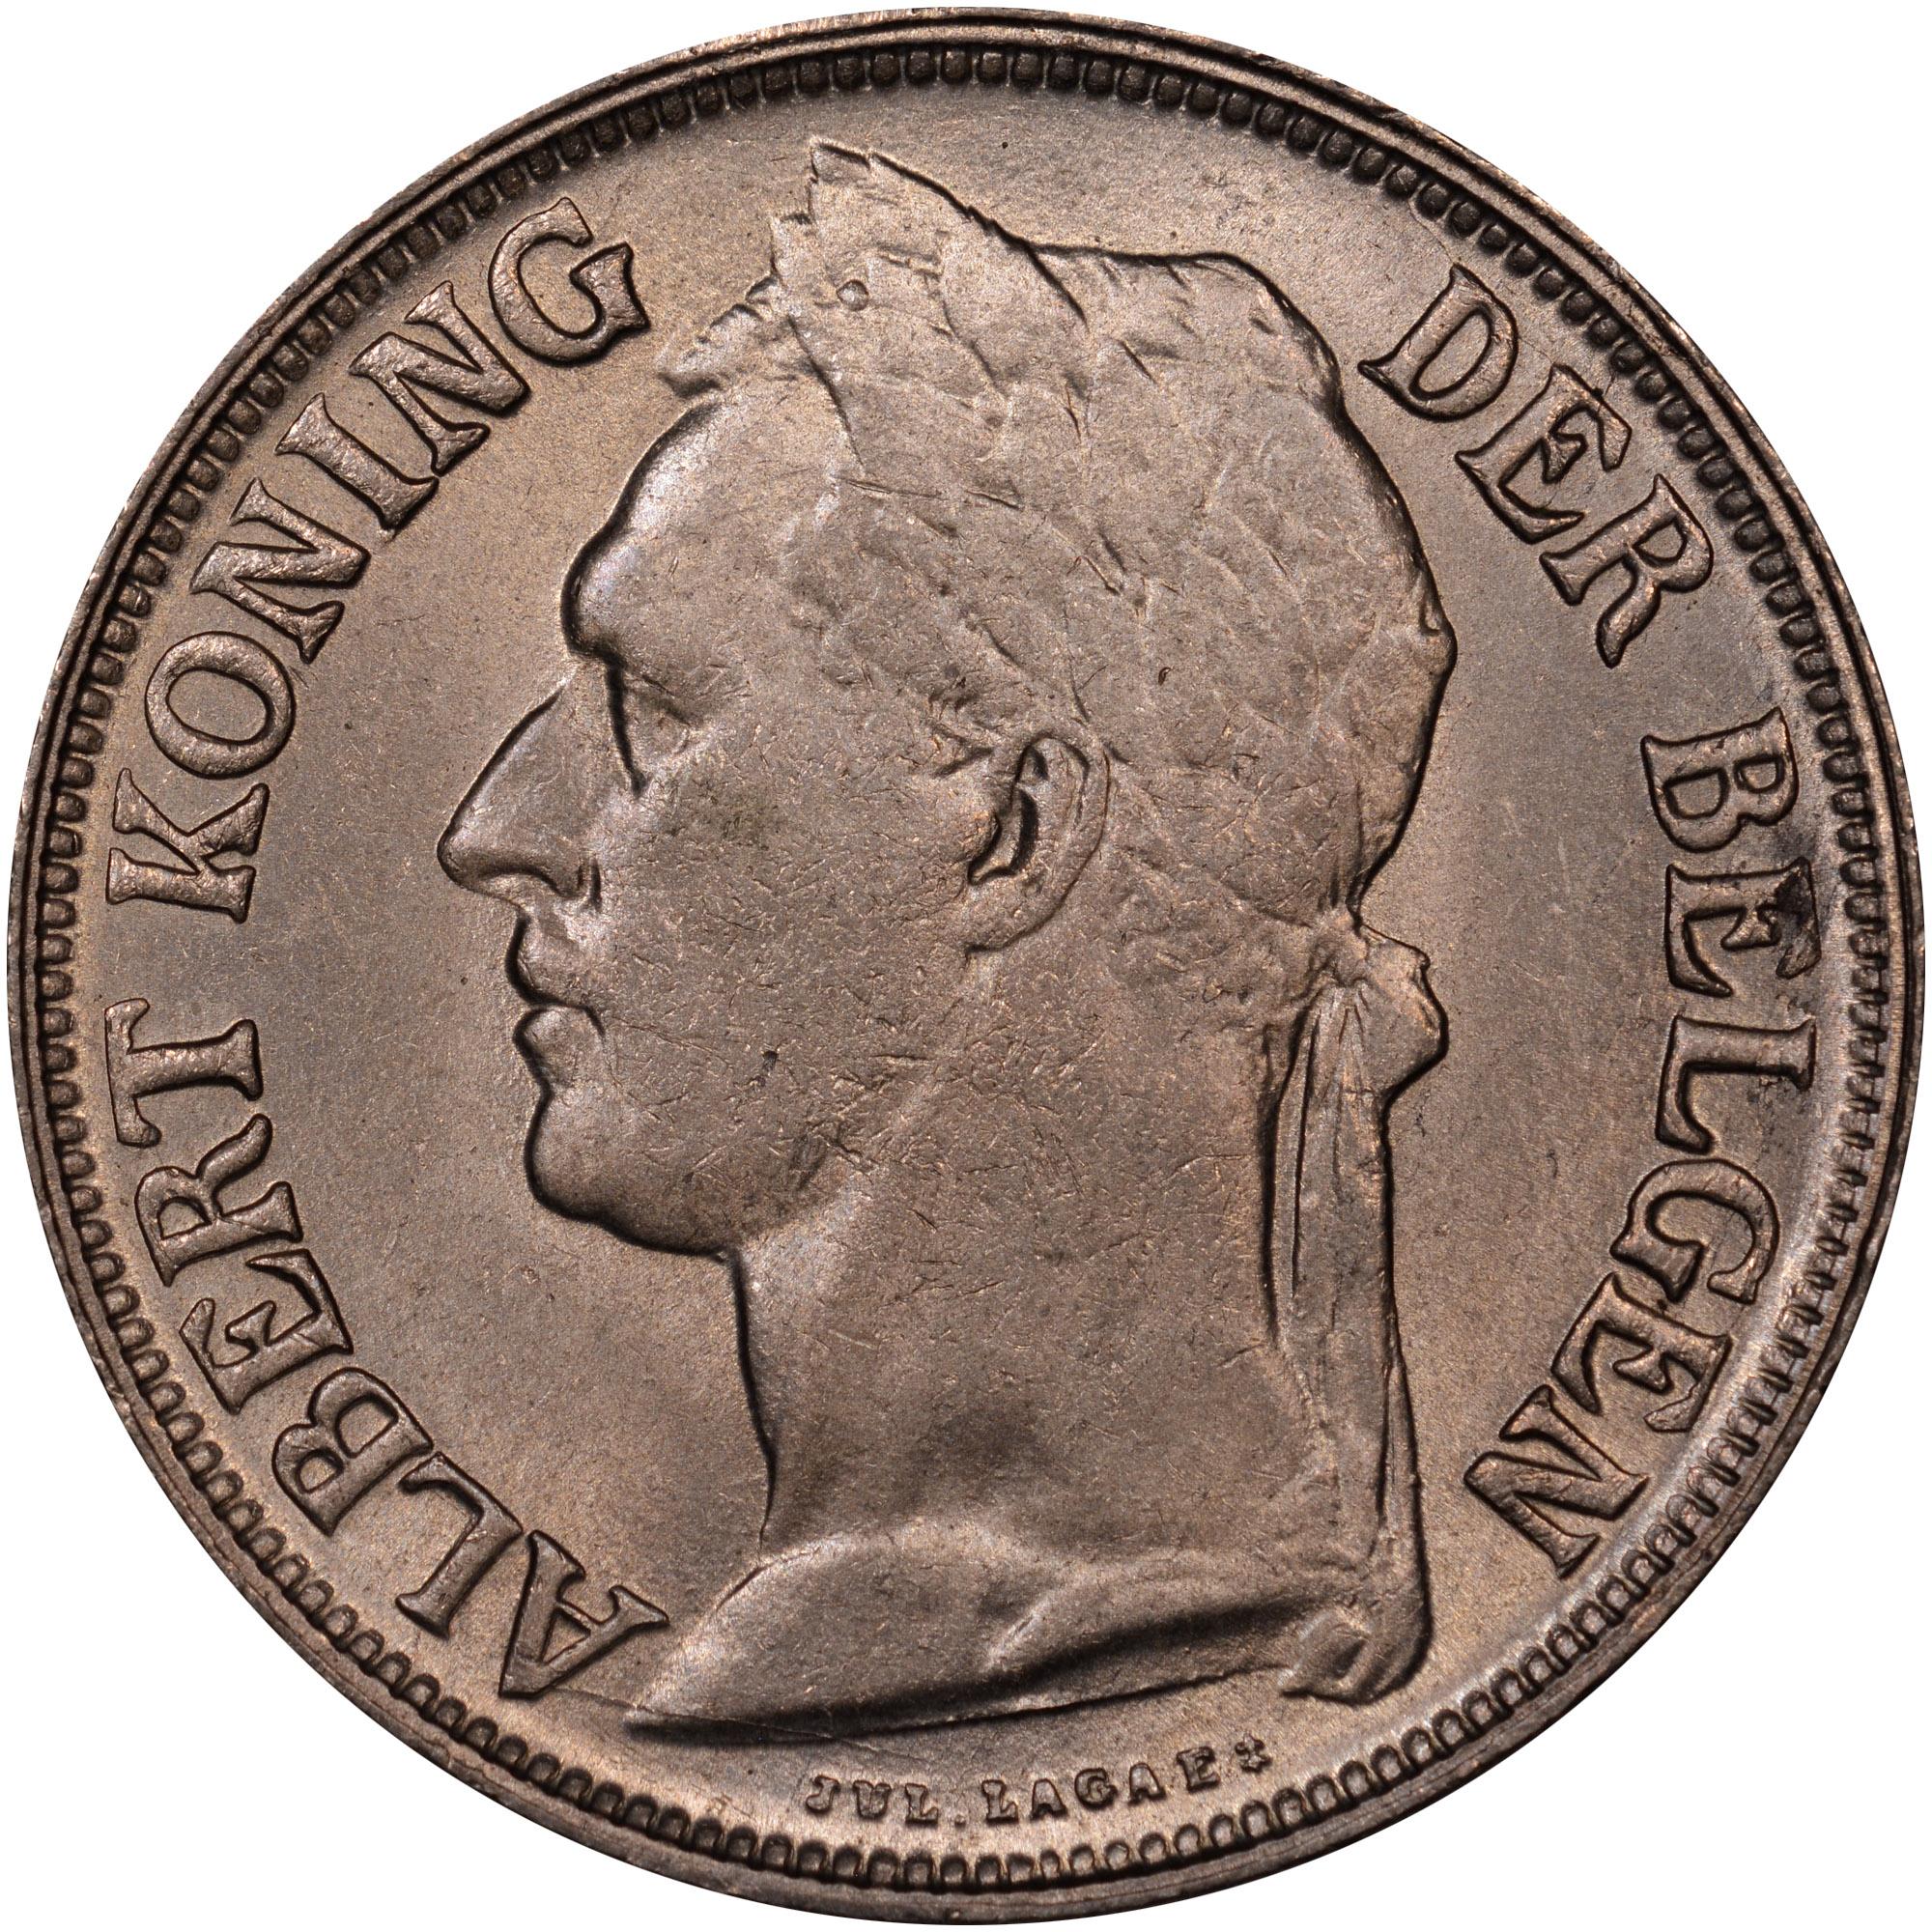 1920-1929 Belgian Congo Franc obverse